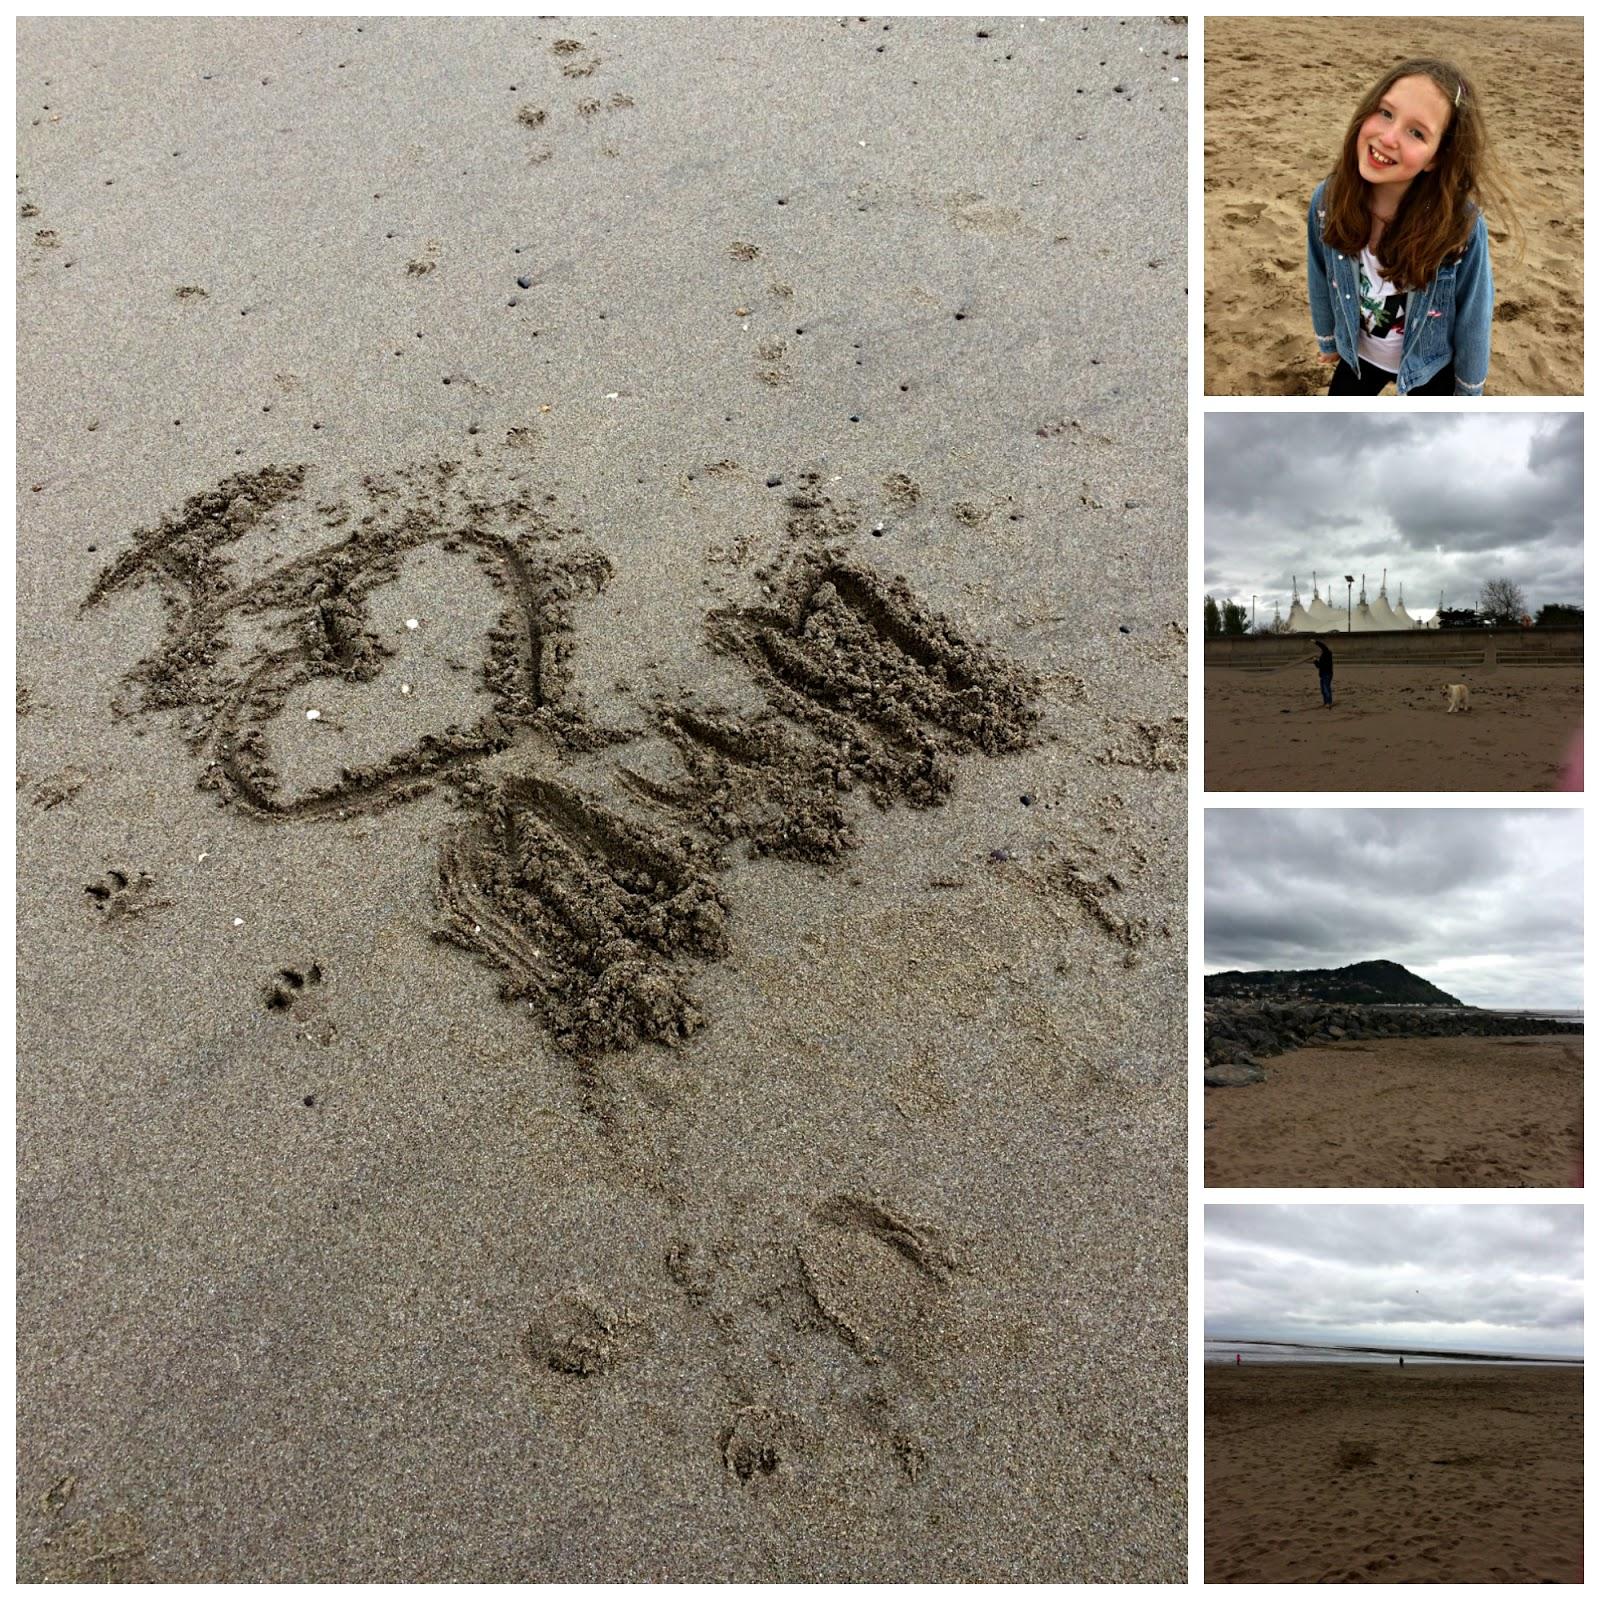 Collage of Minehead Beach with Caitlin